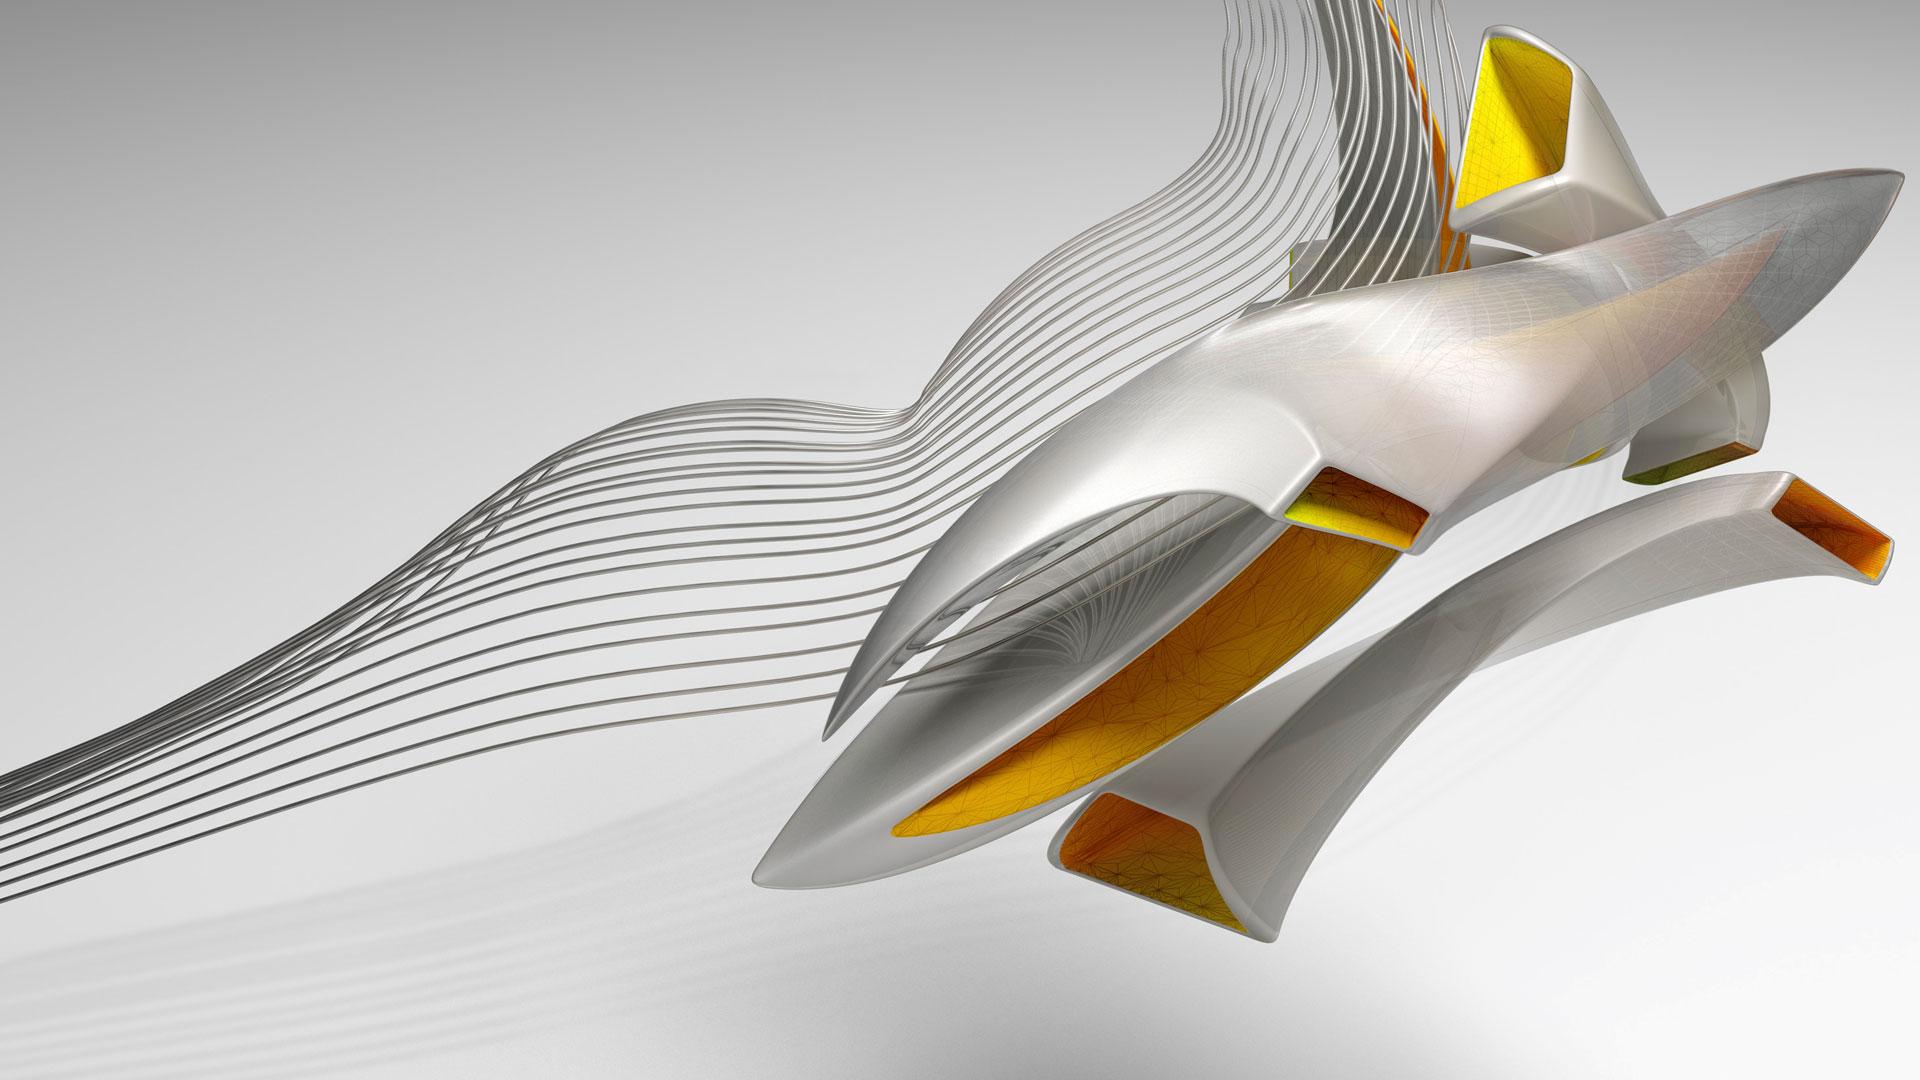 autodesk-inventor-background image